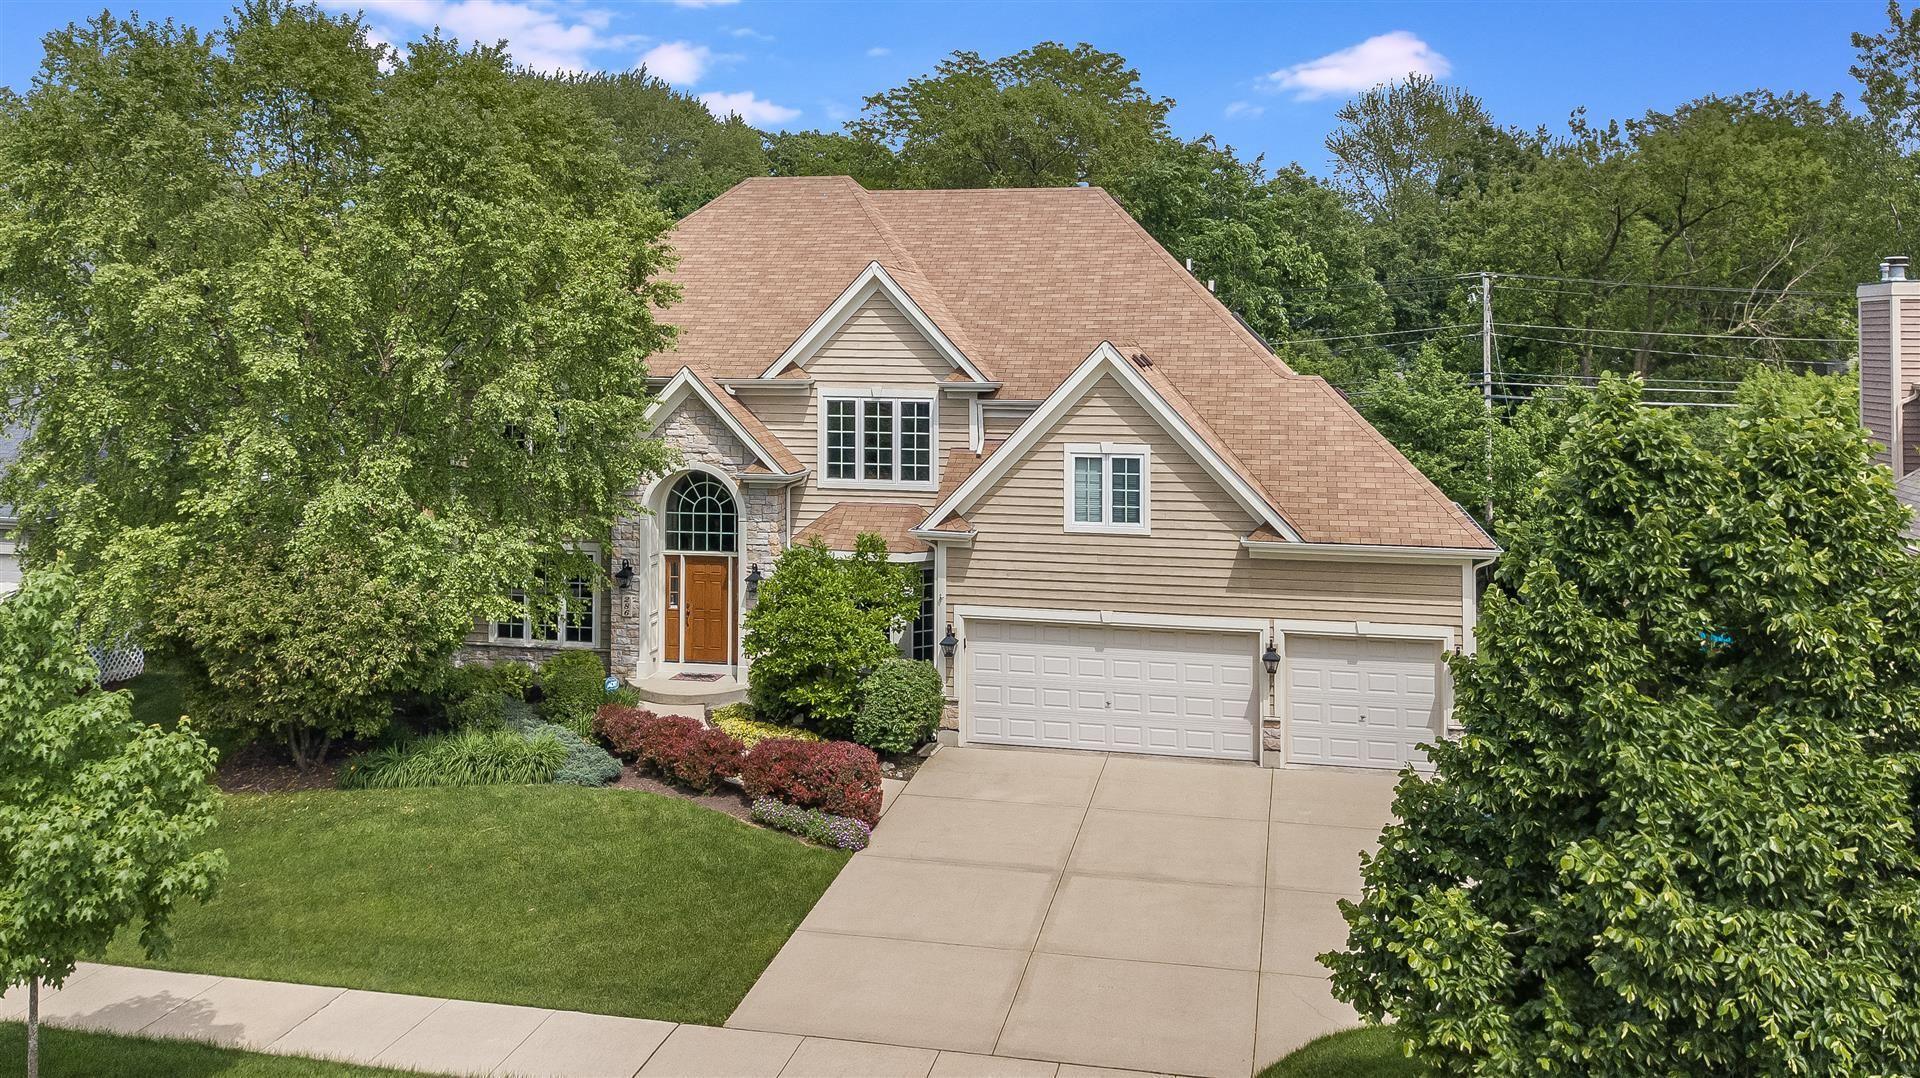 286 Violet Lane, Batavia, IL 60510 - #: 10738328